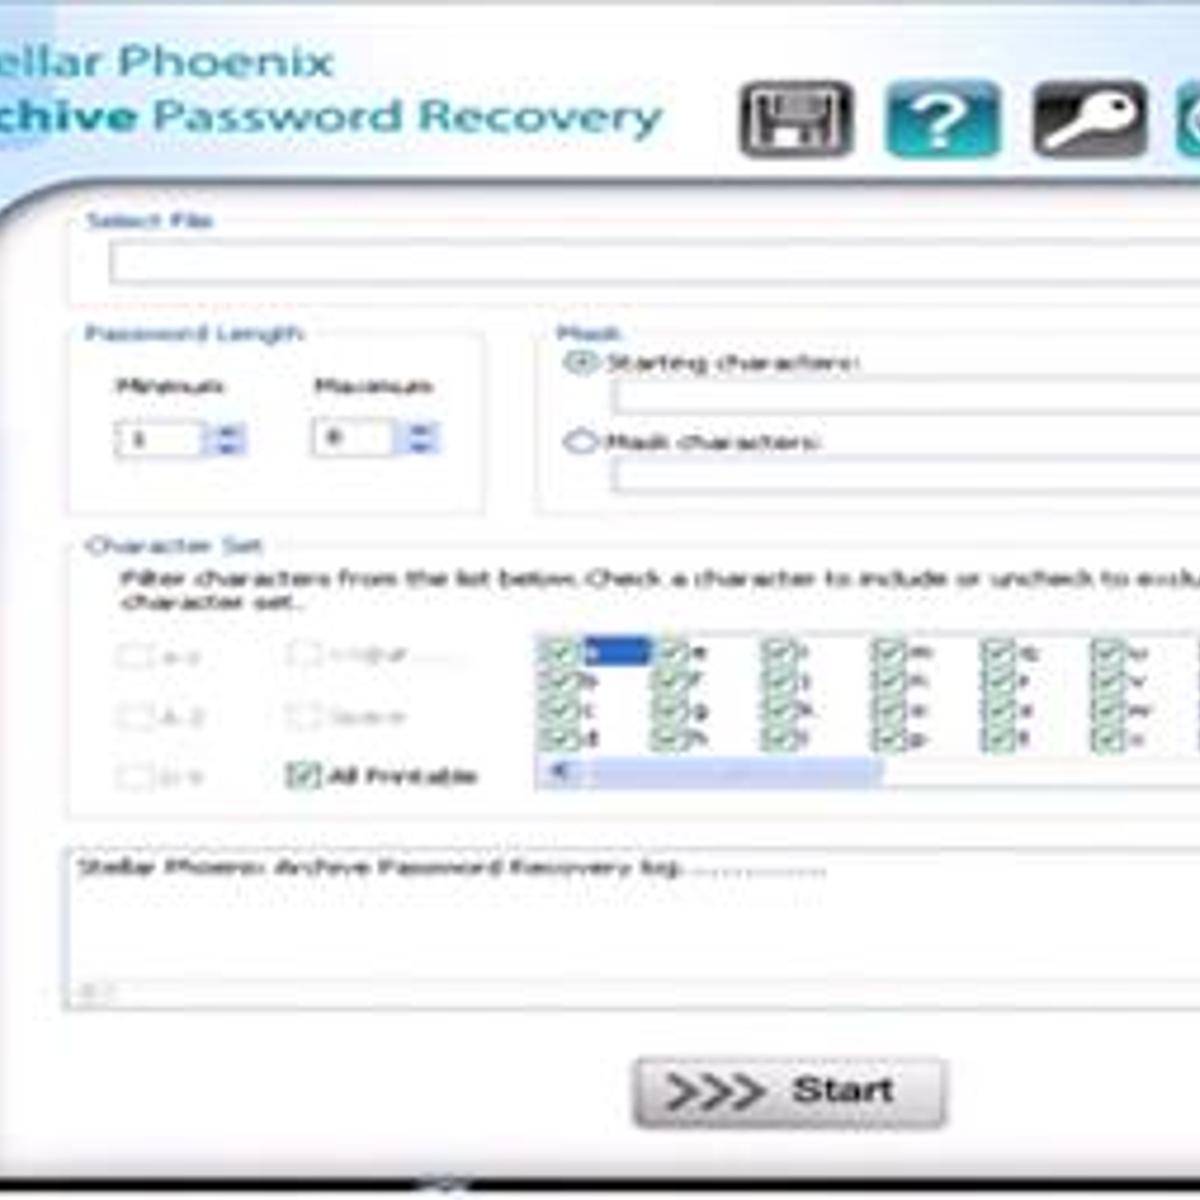 Stellar Phoenix Archive Password Recovery Alternatives and